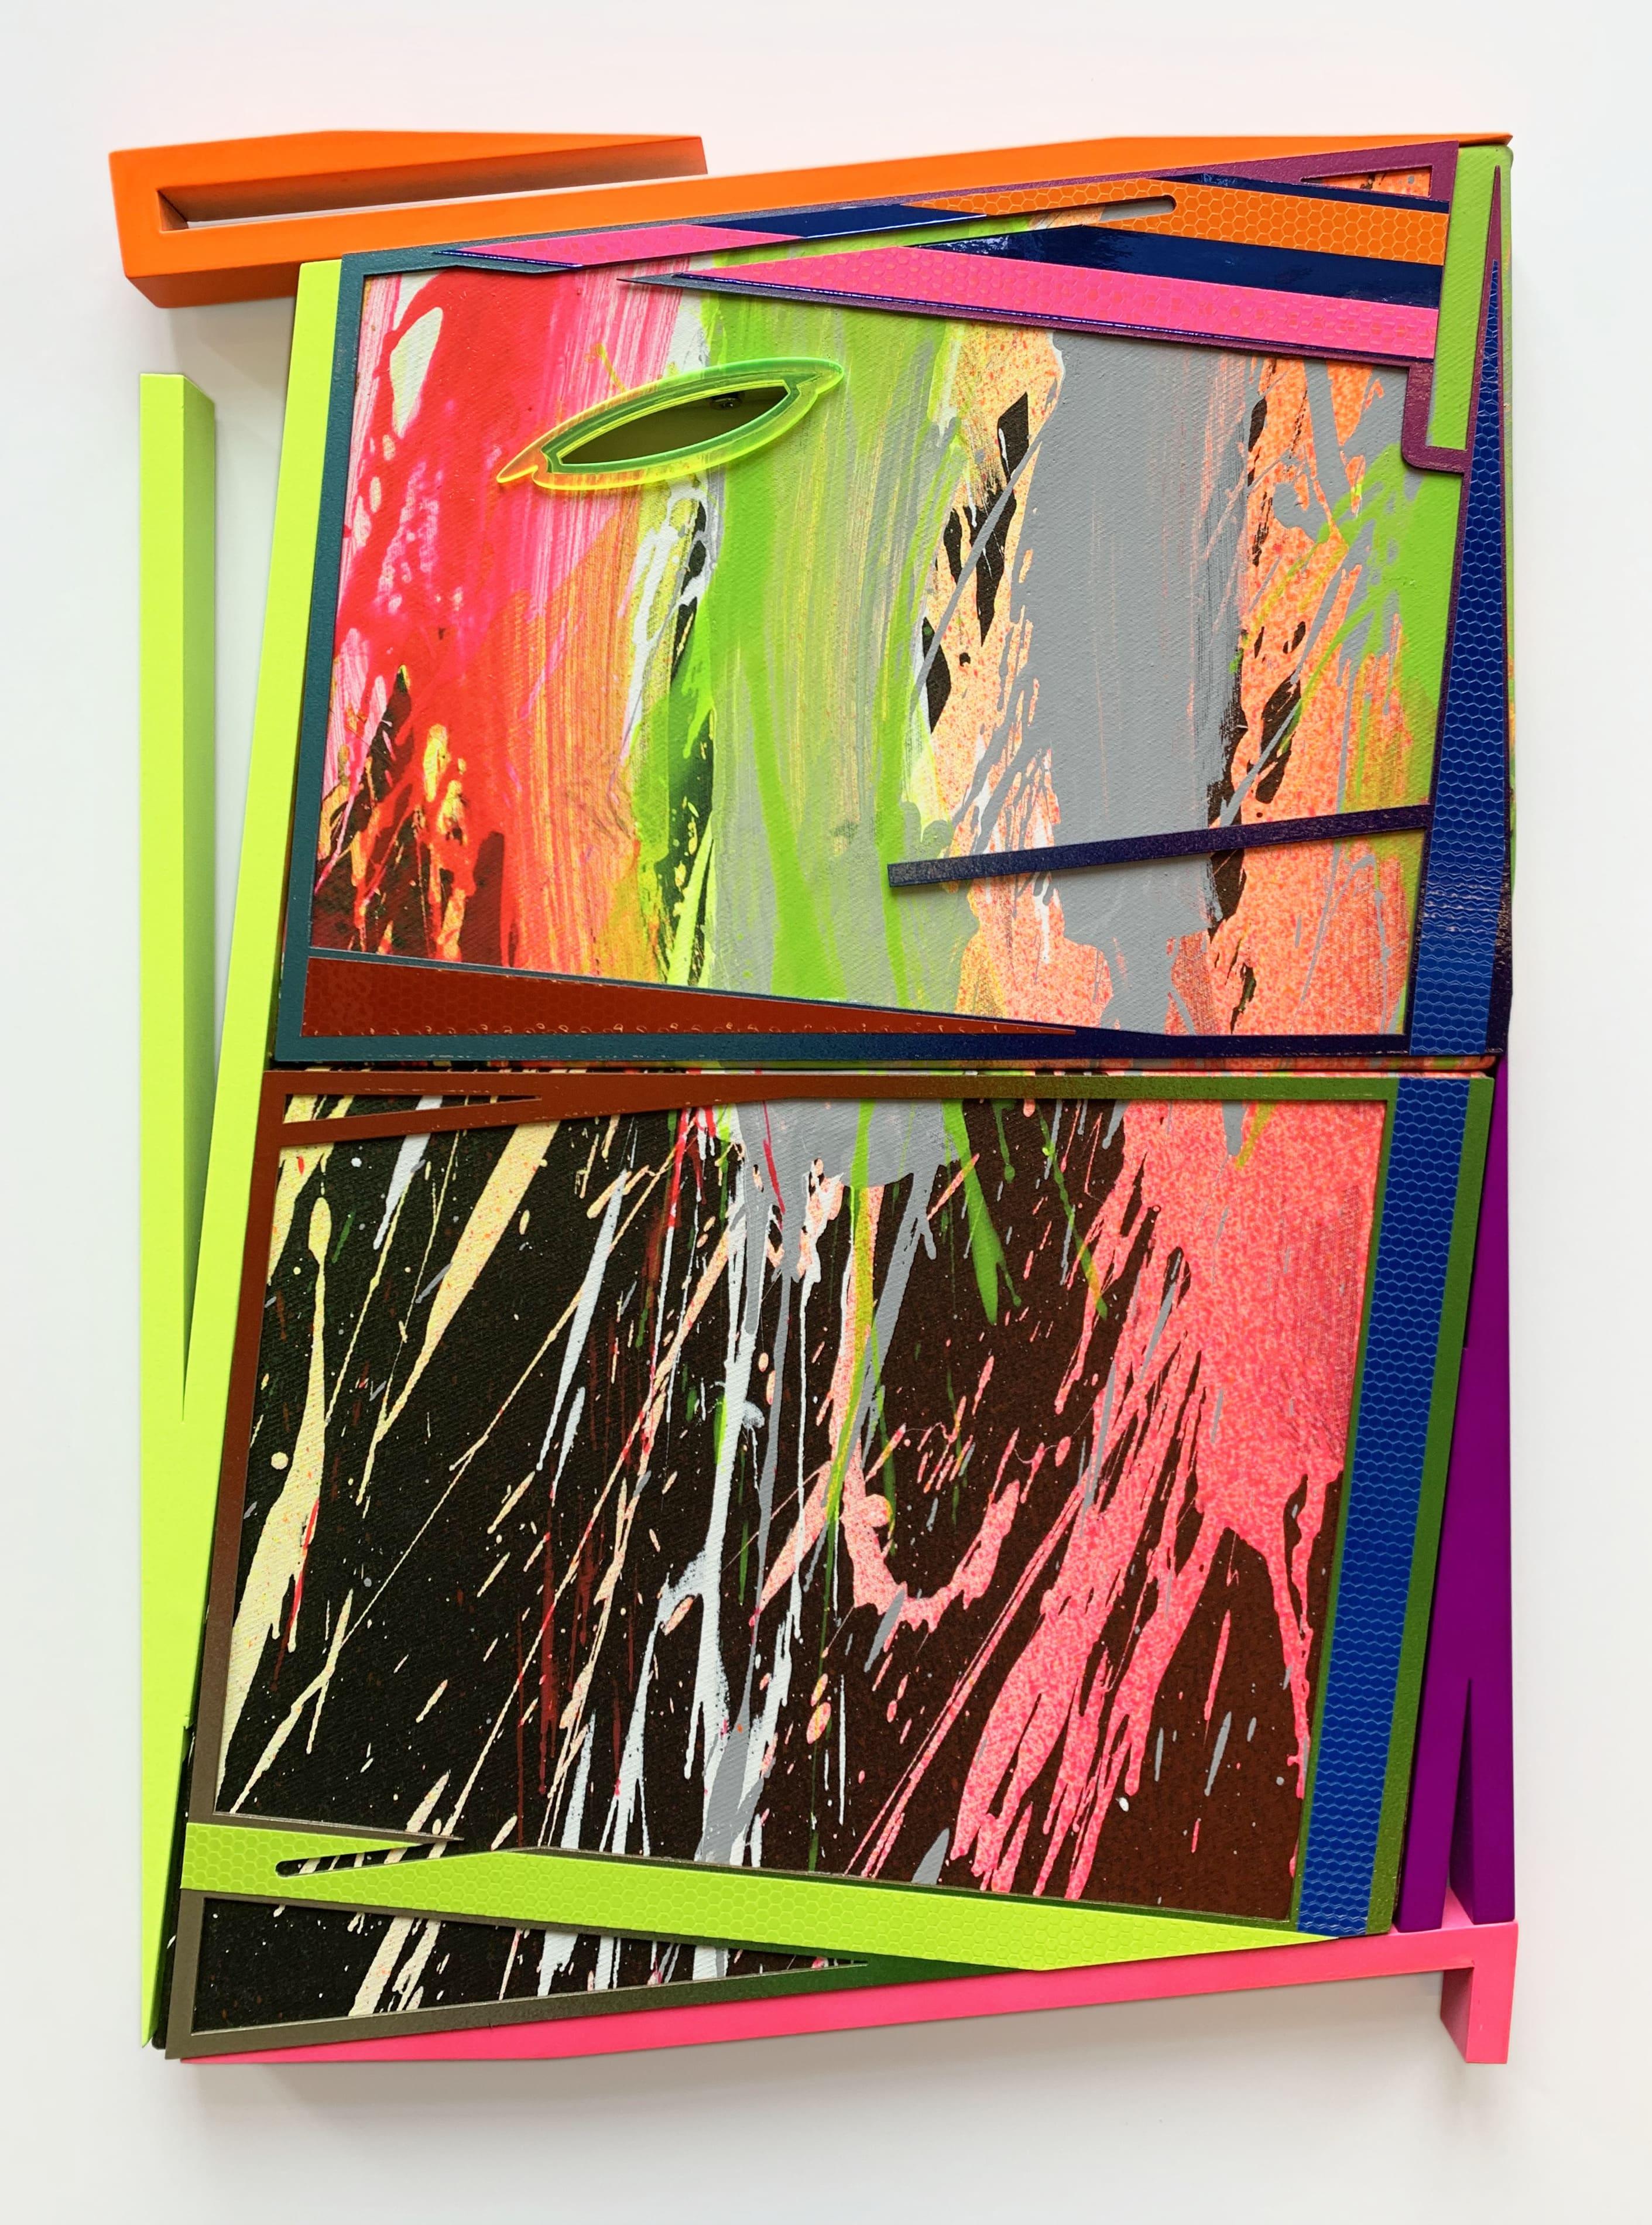 NemesM_The-Same-River-02_2020_57x40cm_waterjet-aluminium-carpaint-acrilyc-foamex-pvc-light-reflective-vinyl-mirror-board-wood-min